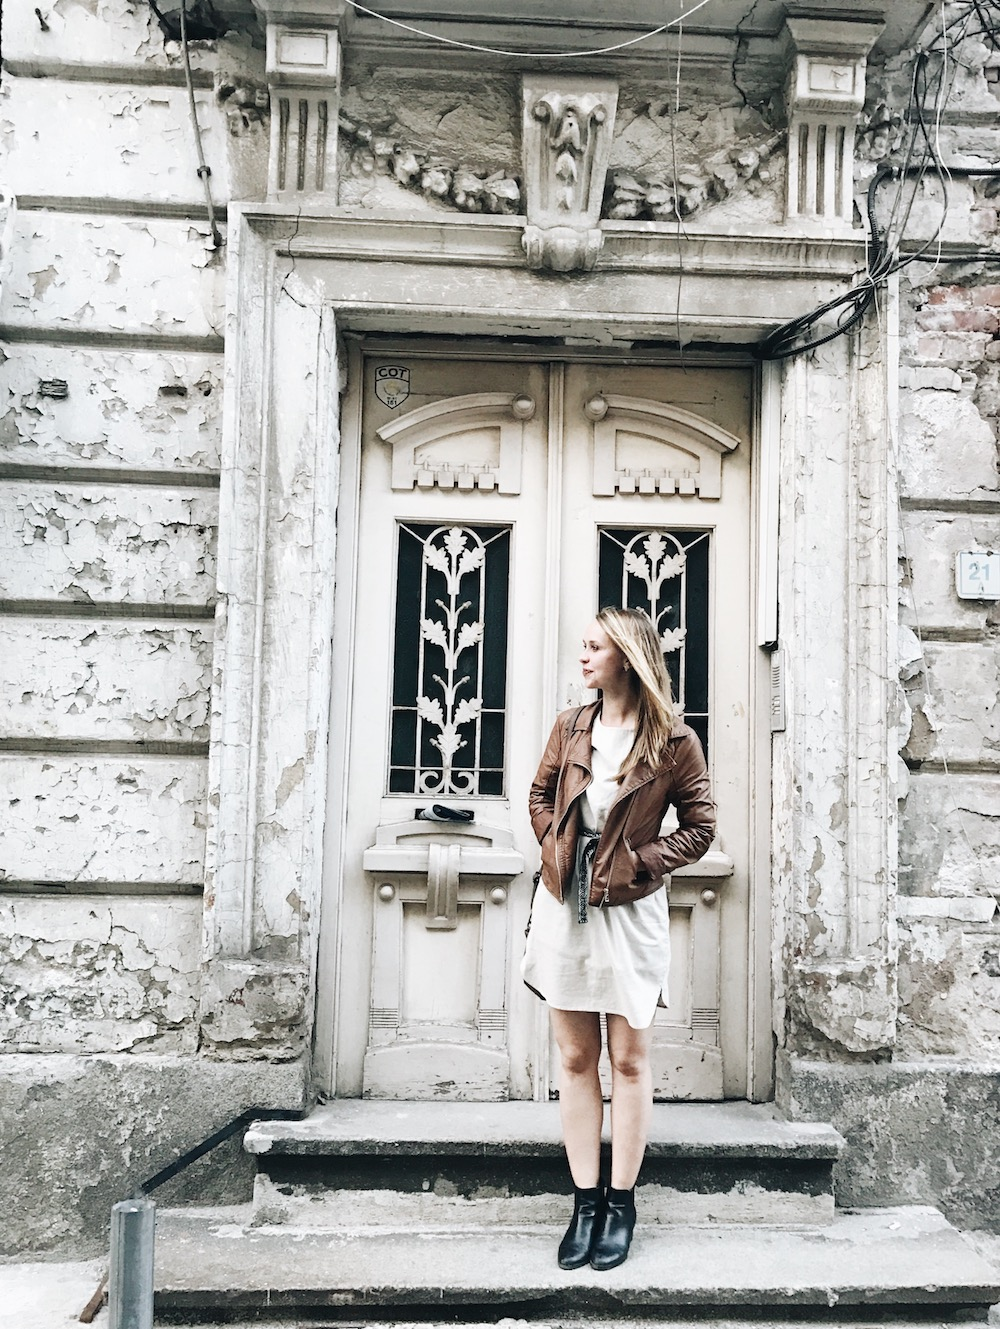 Sofia, Bulgaria | Travel Guide by Ruby Josephine